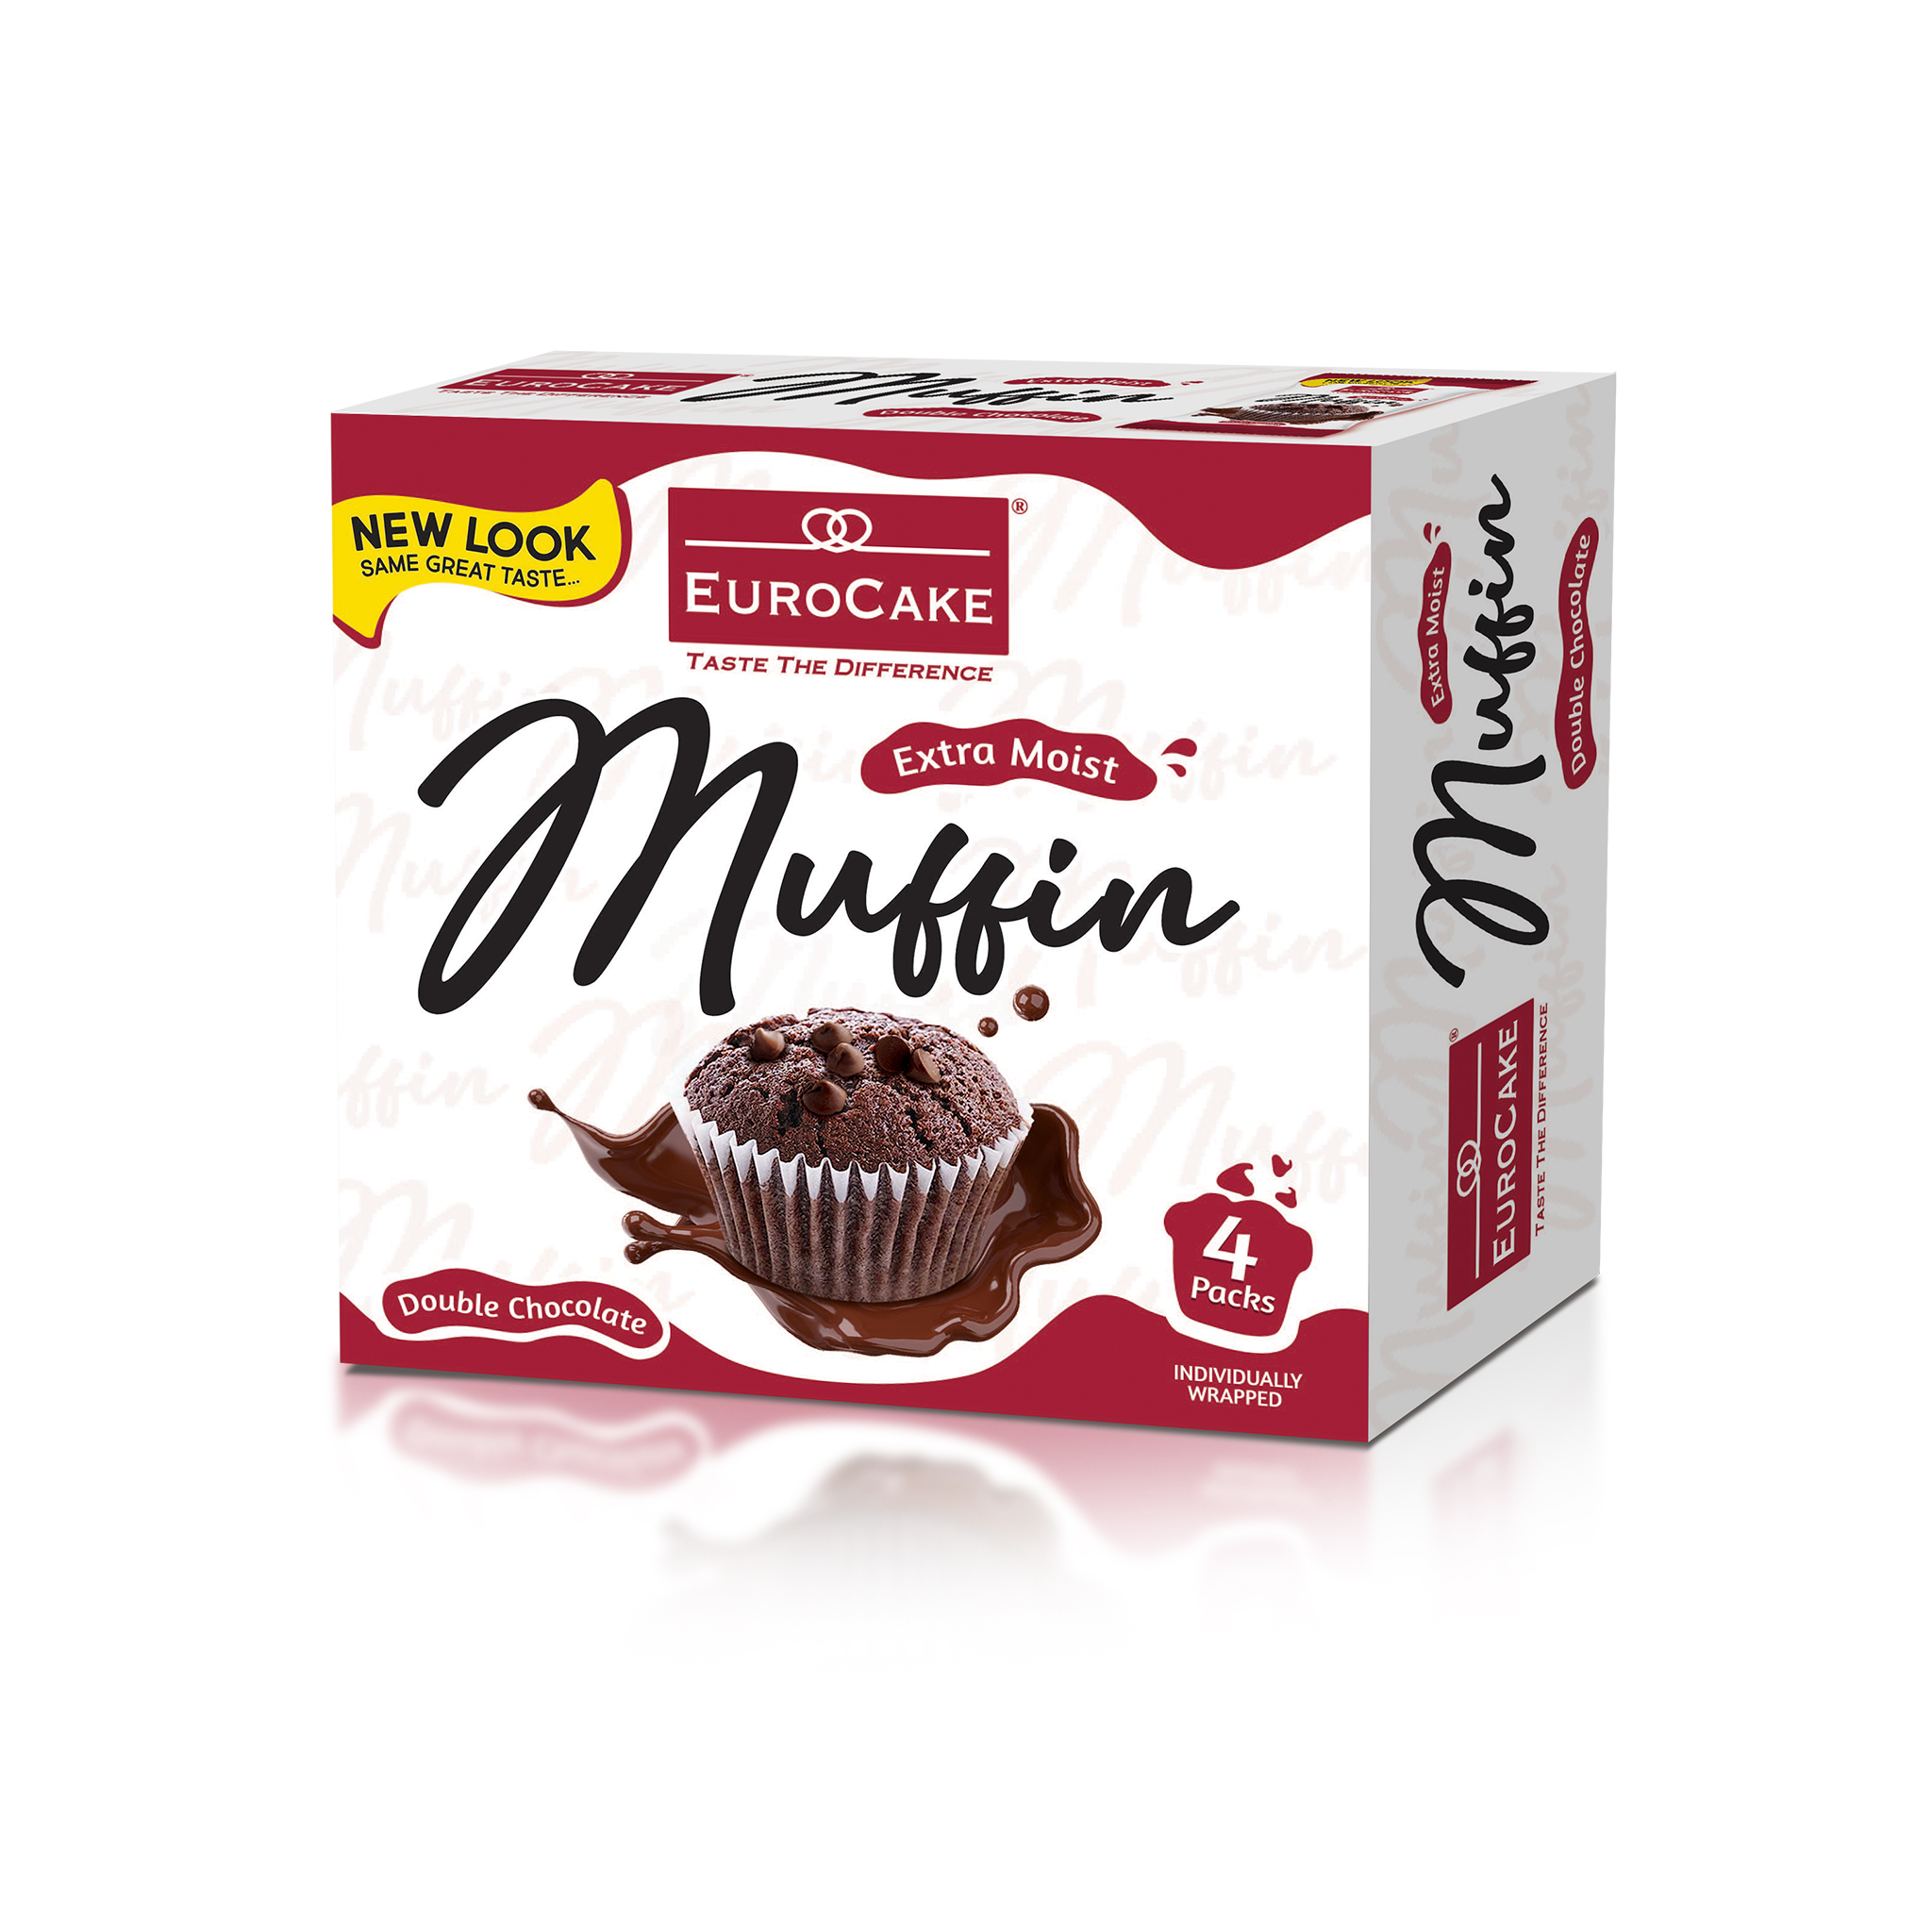 EUROCAKE-DOUBLE-CHOCOLATE-MUFFIN-BOX